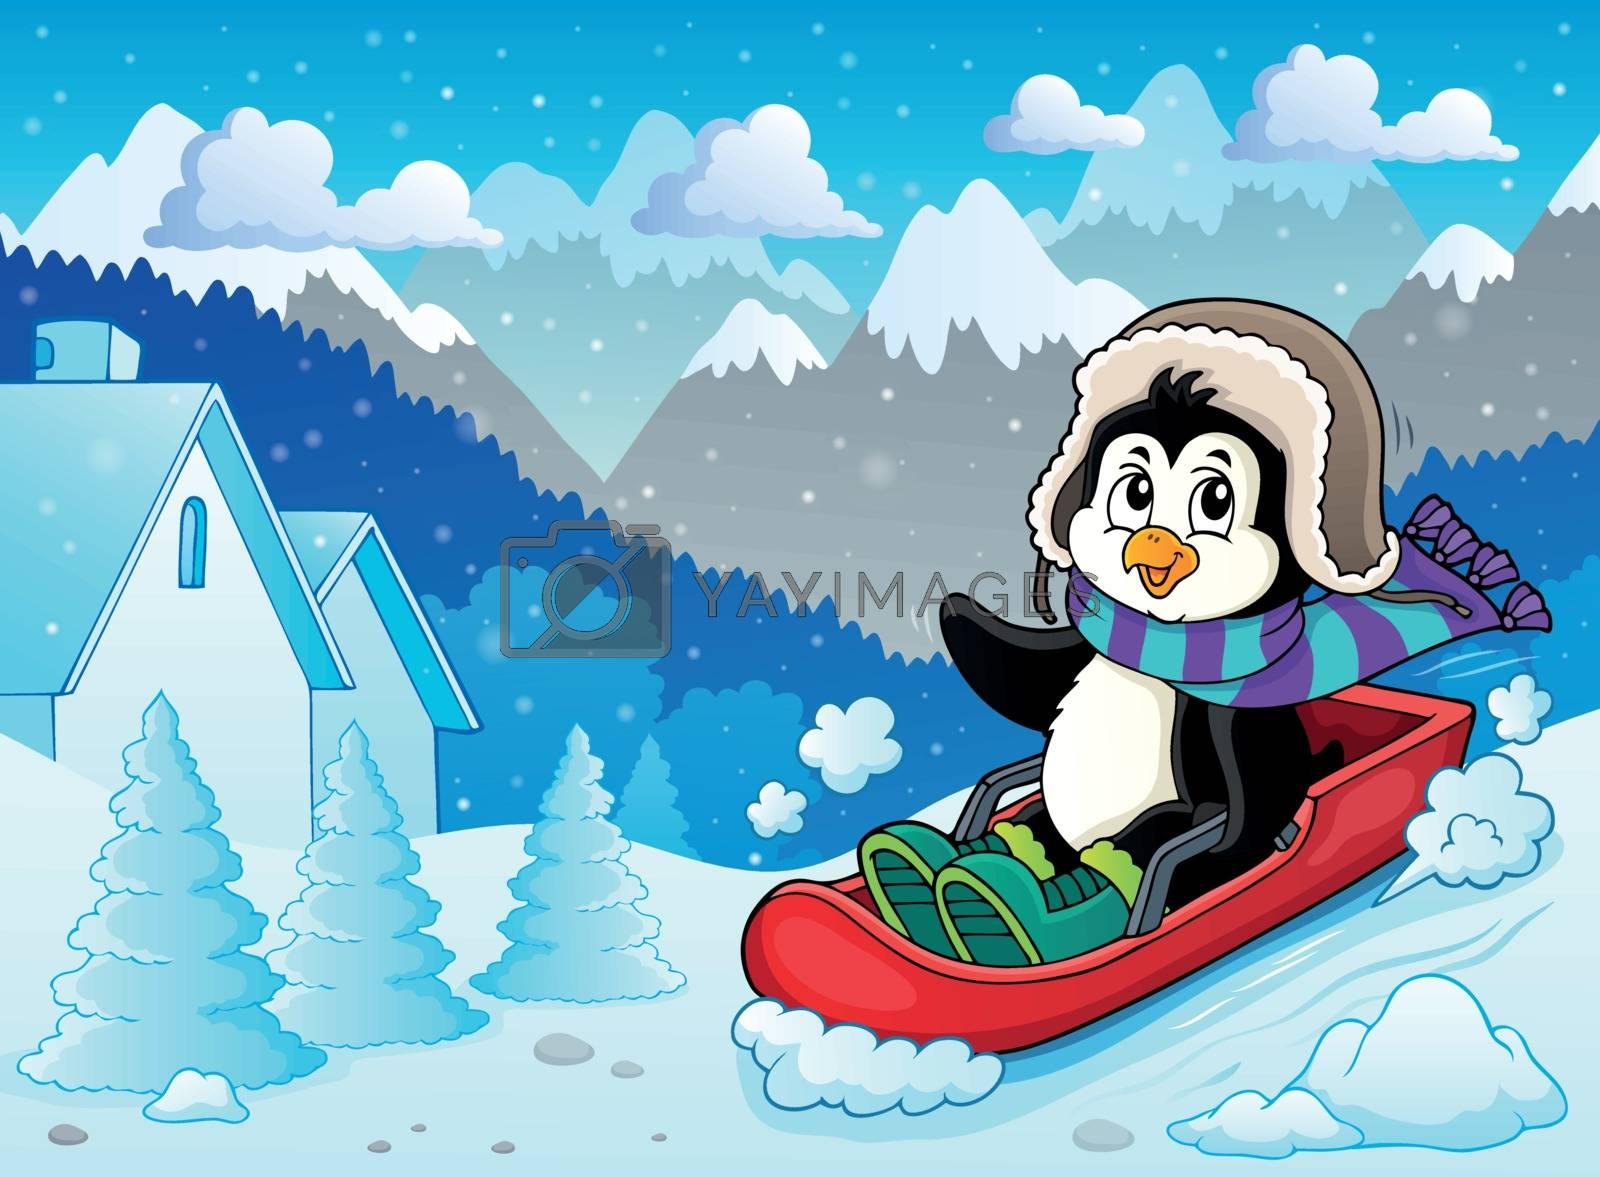 Penguin on bobsleigh theme image 2 - eps10 vector illustration.